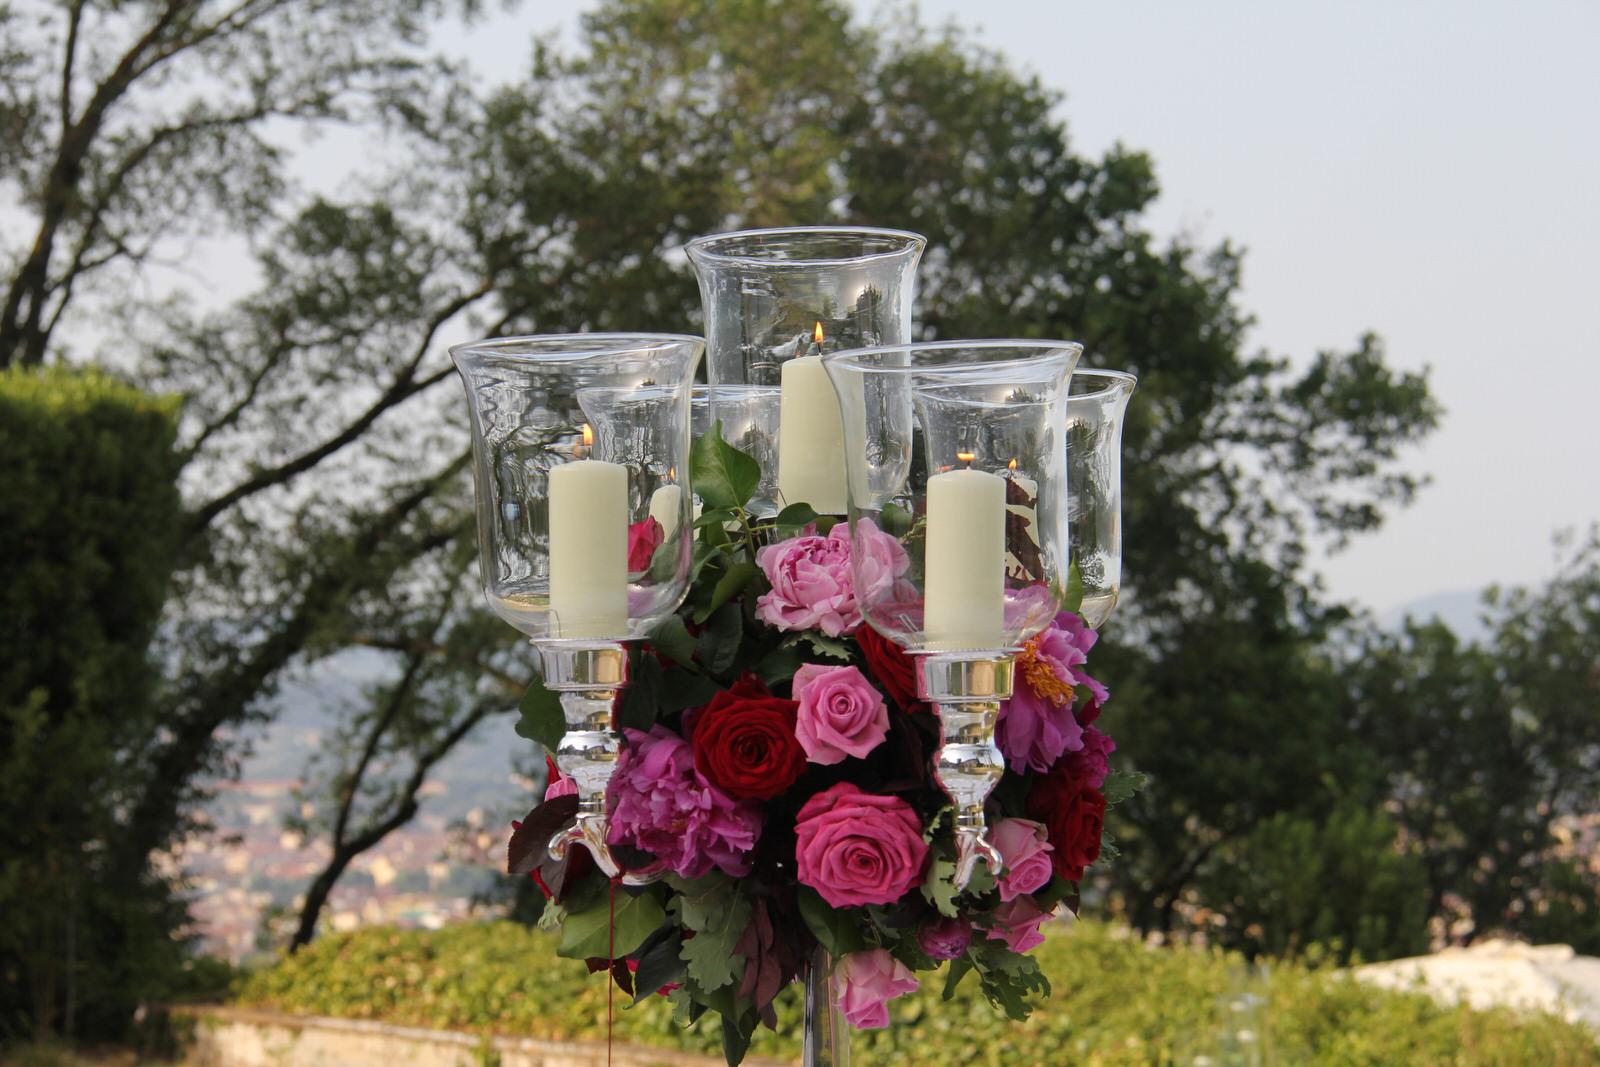 tuscany-wedding-planners-floristen-41.JPG